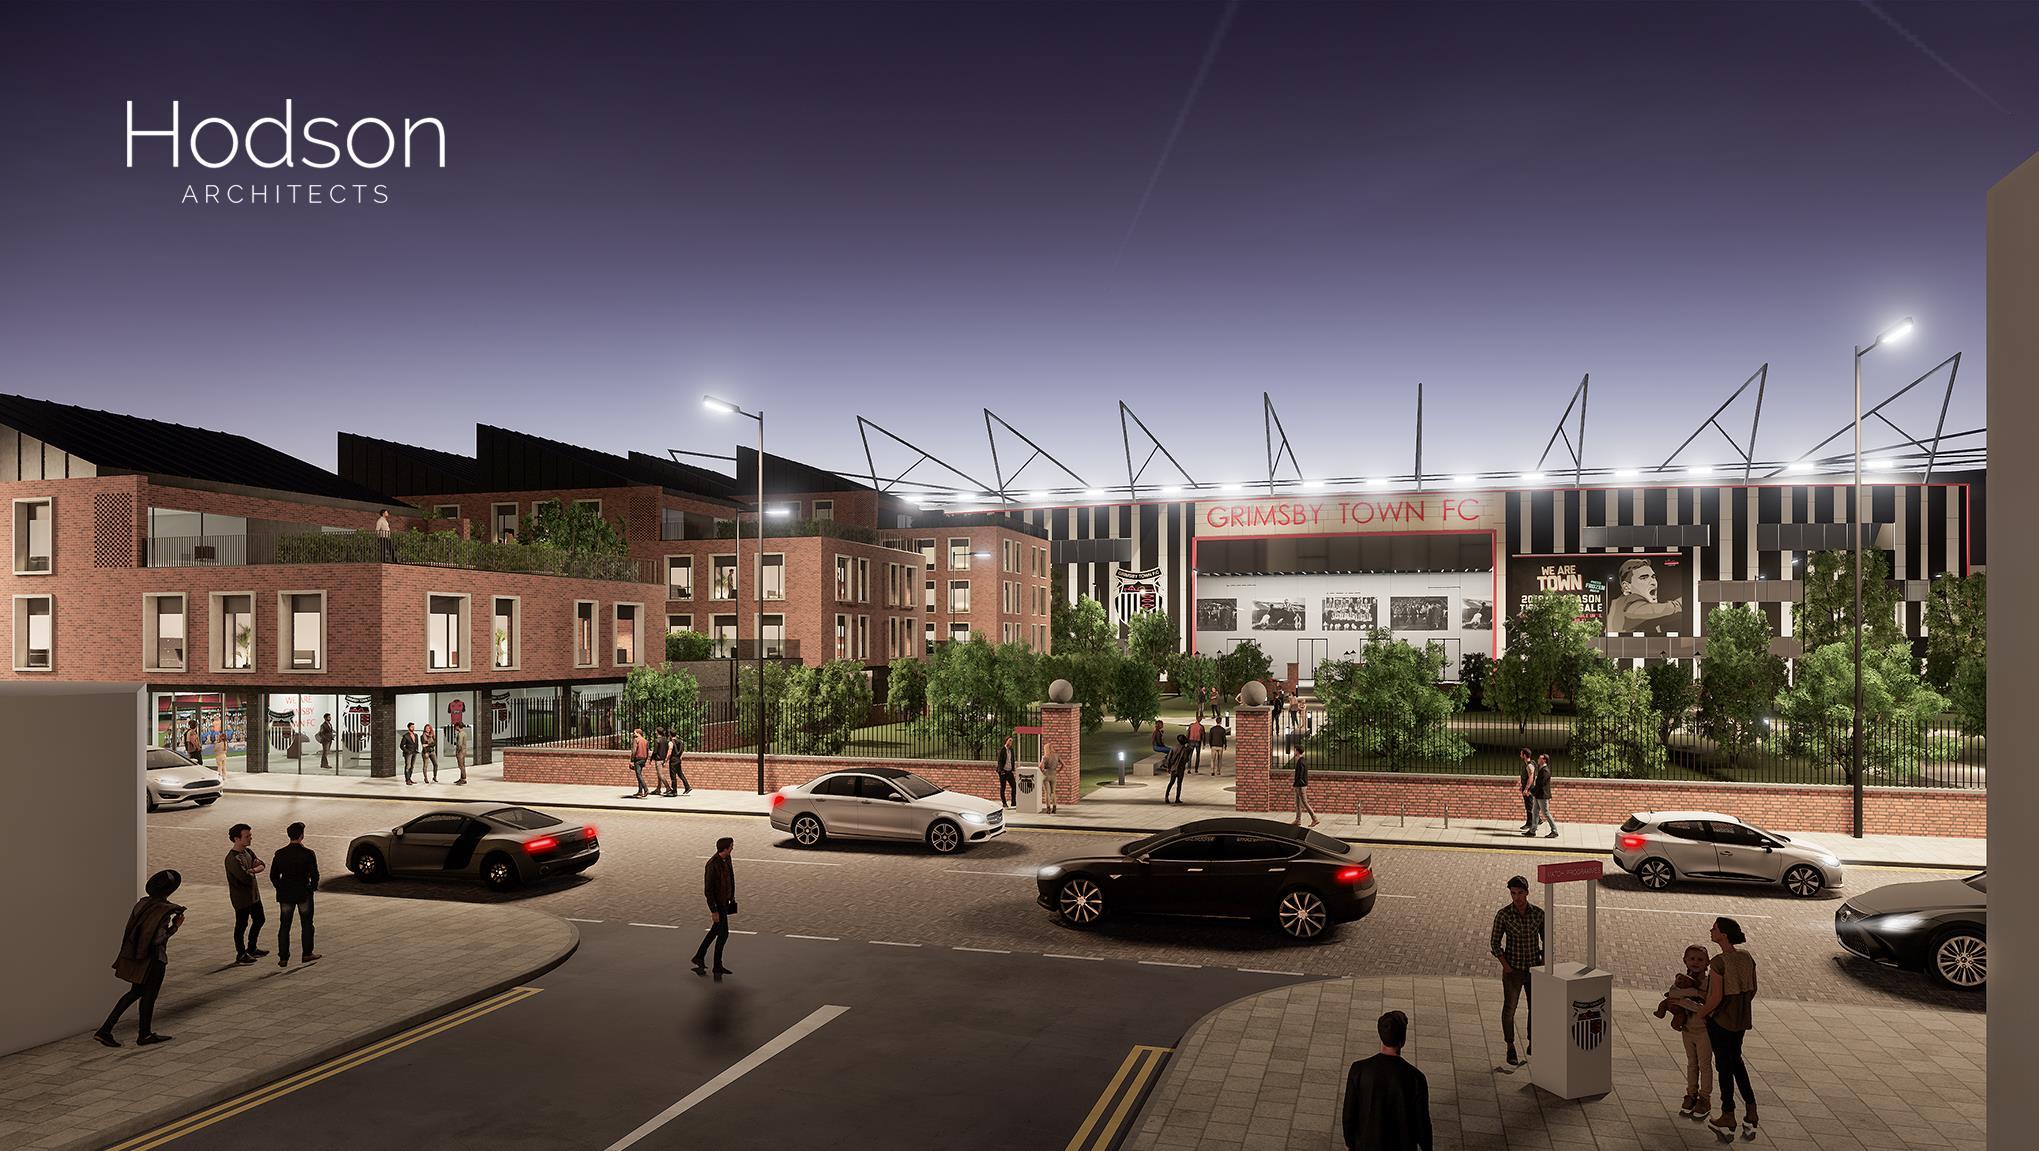 Grimsby Town Stadium